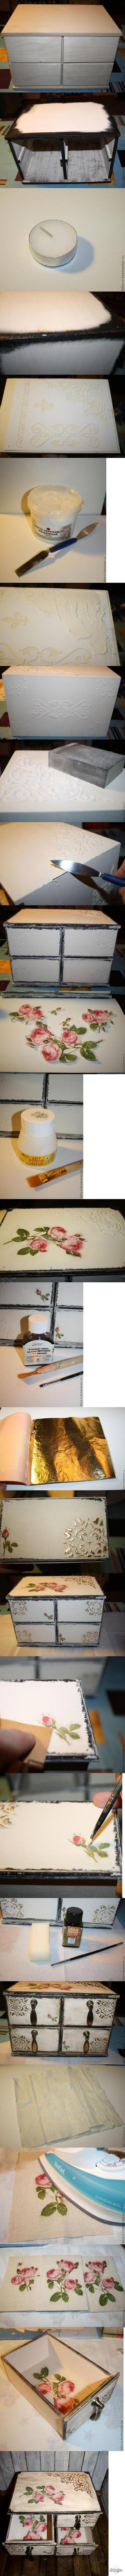 Мини-комод «Сhic» http://dcpg.ru/mclasses/1232/  Click on photo to see more! Нажмите на фото чтобы увидеть больше! decoupage art craft handmade home decor DIY do it yourself tutorial